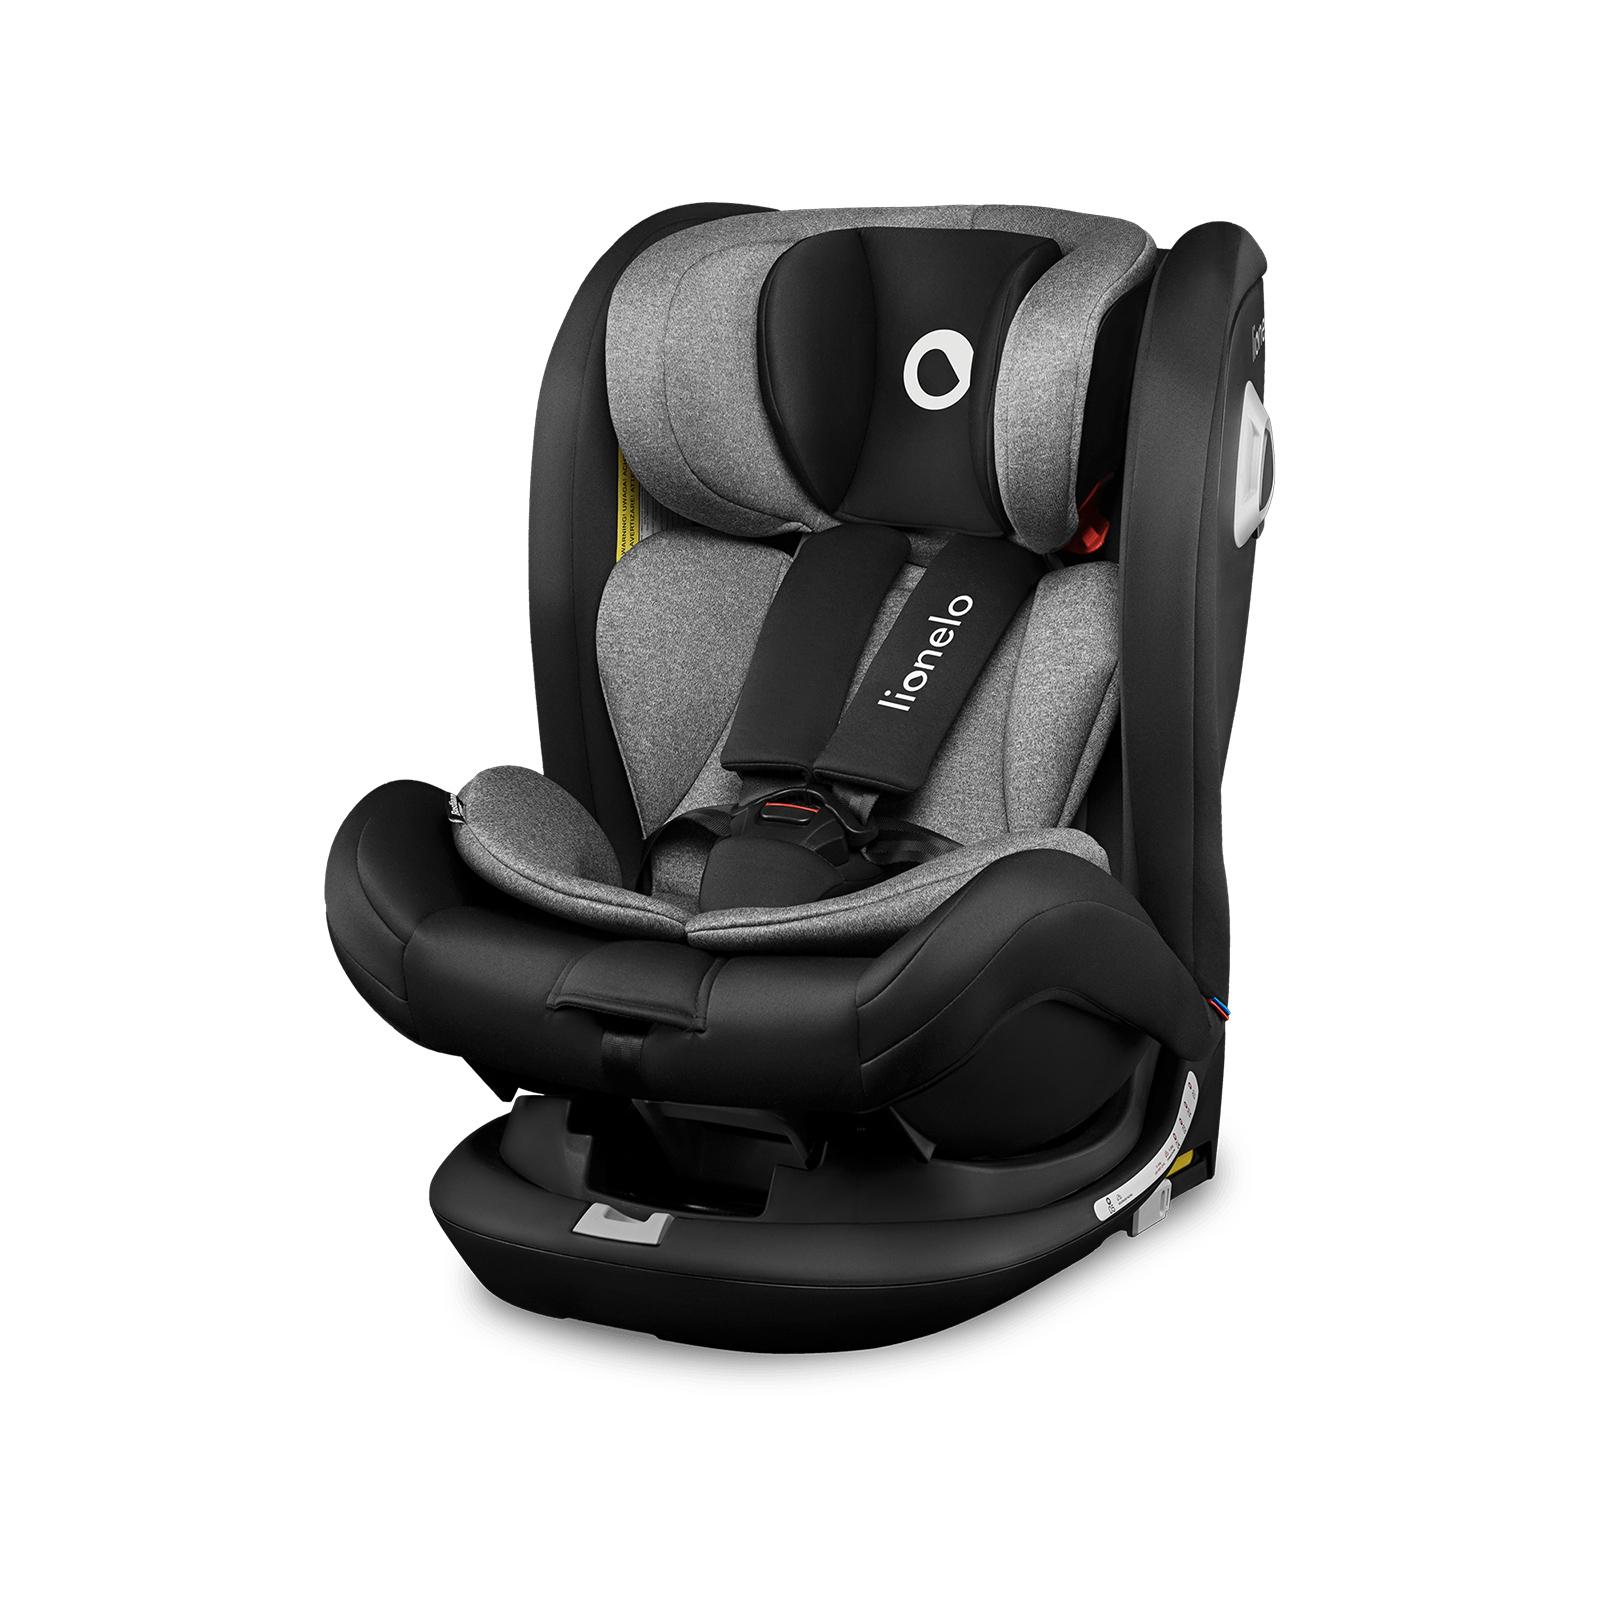 Lionelo Bastiaan RWF Kindersitz Isofix Kindersitz Drehbar um 360 Grad Top Tether